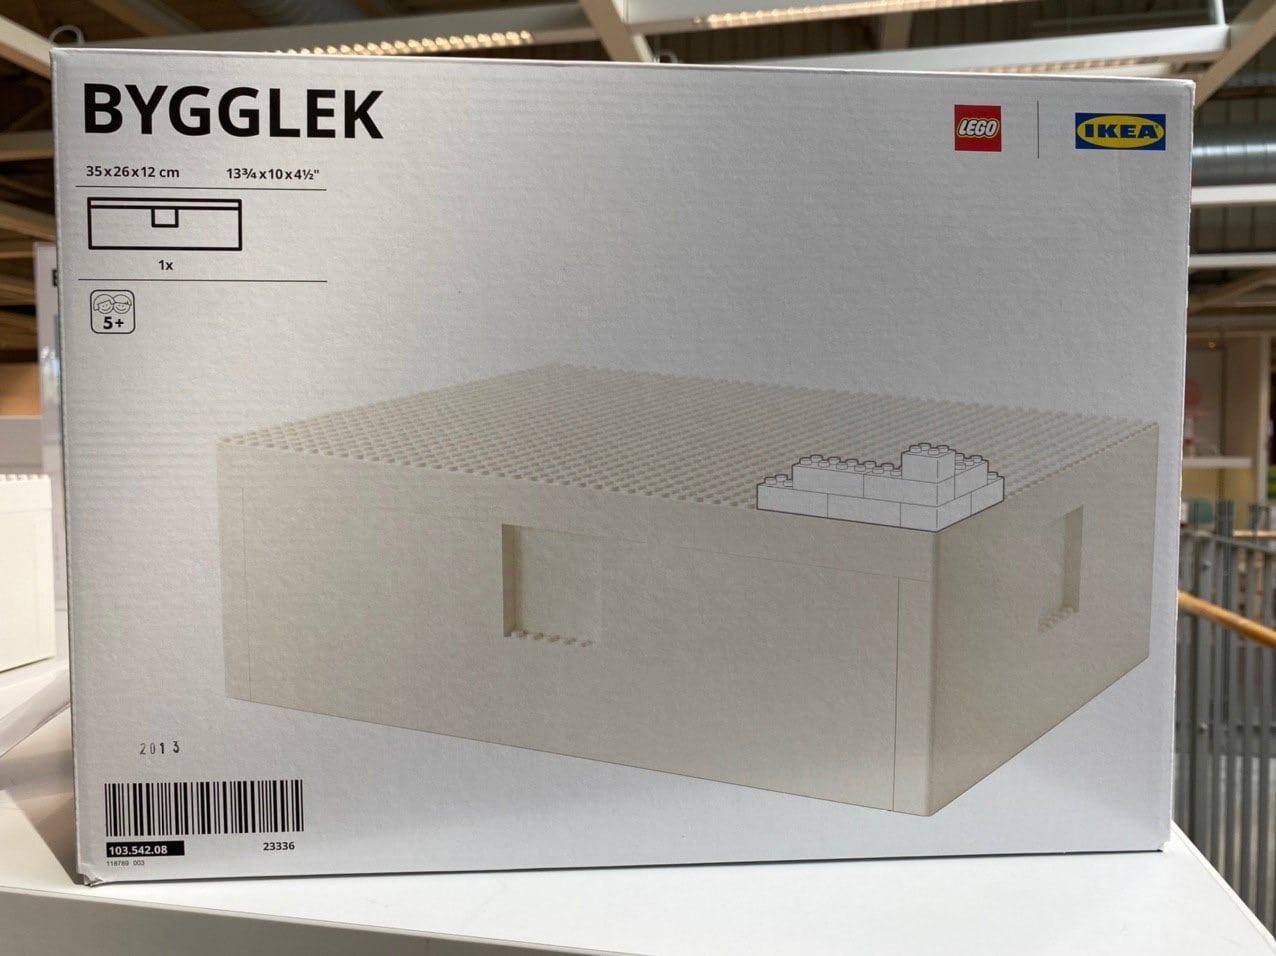 ikea-bygglek-lego-large